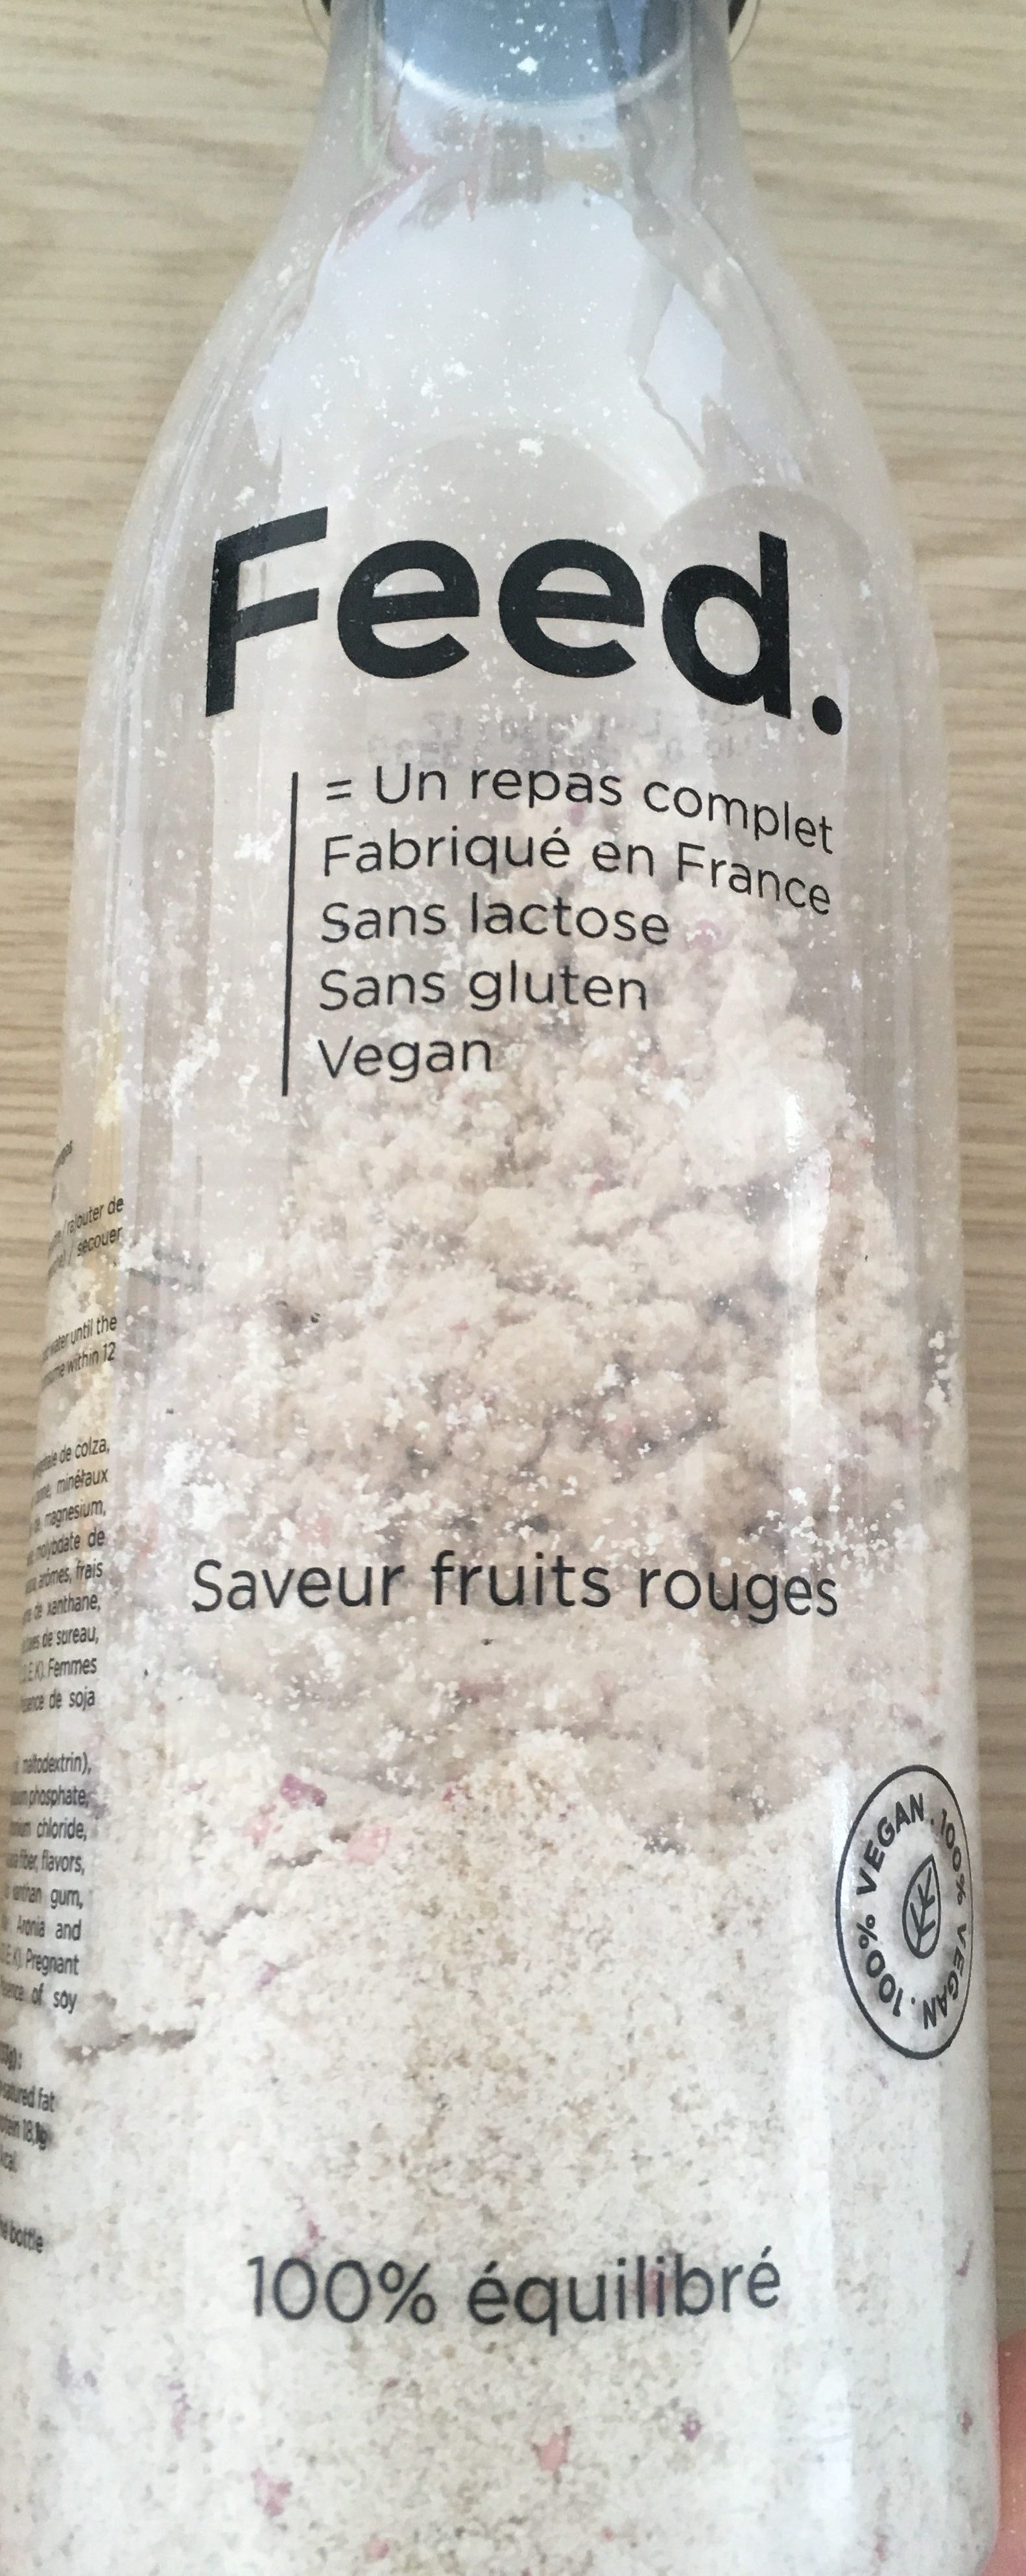 Feed Saveur fruits rouges - Produit